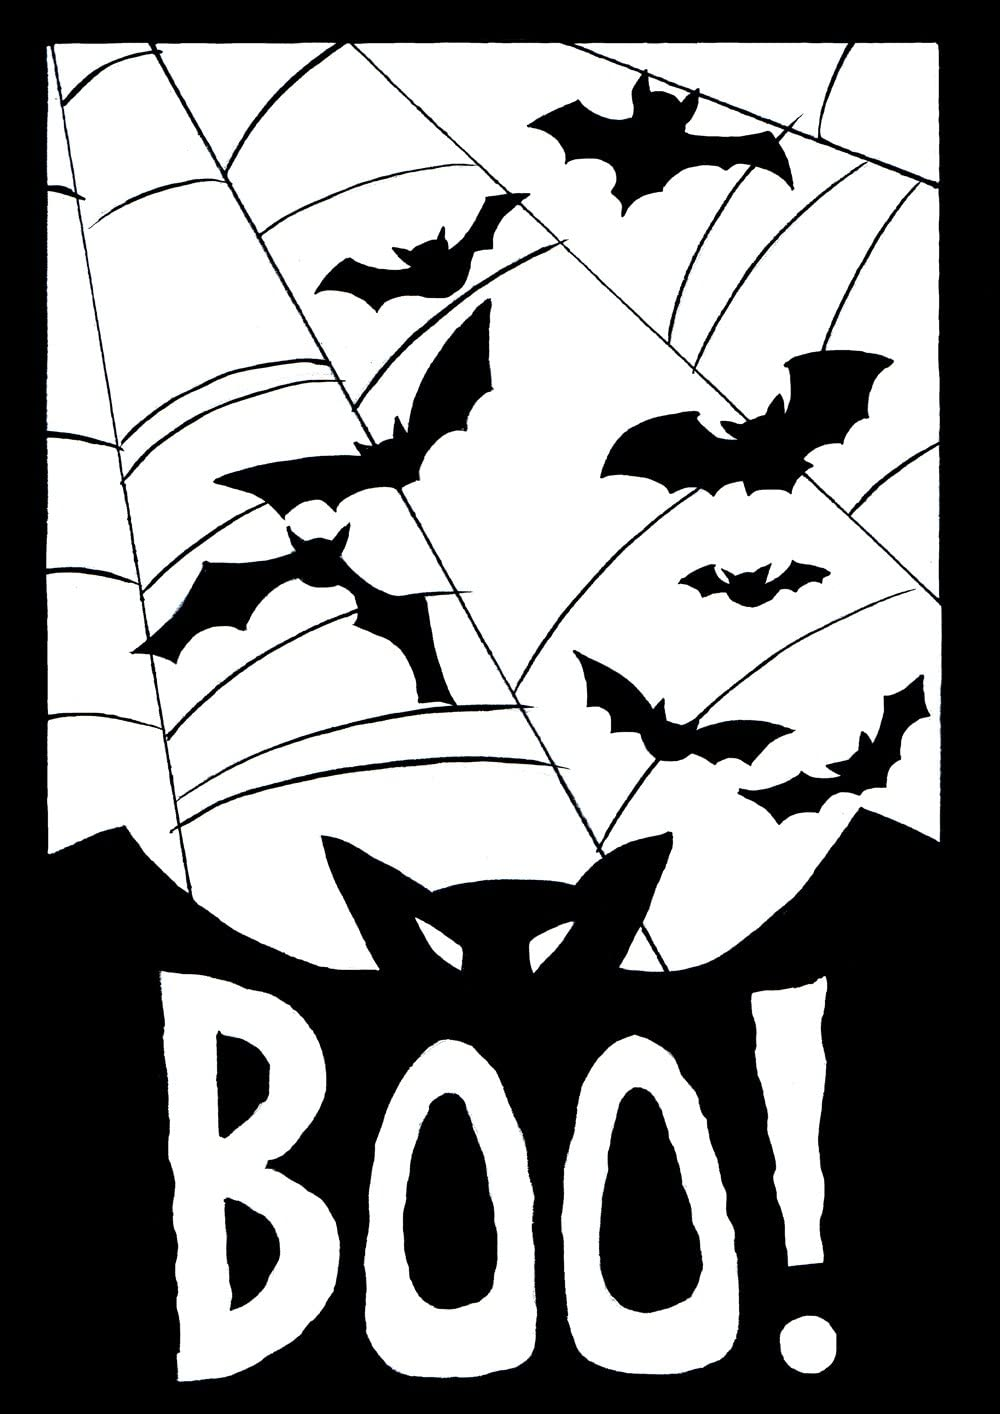 Toland Home Garden Boo 12.5 x 18 Inch Decorative Spooky Halloween Bat Spider Web Garden Flag